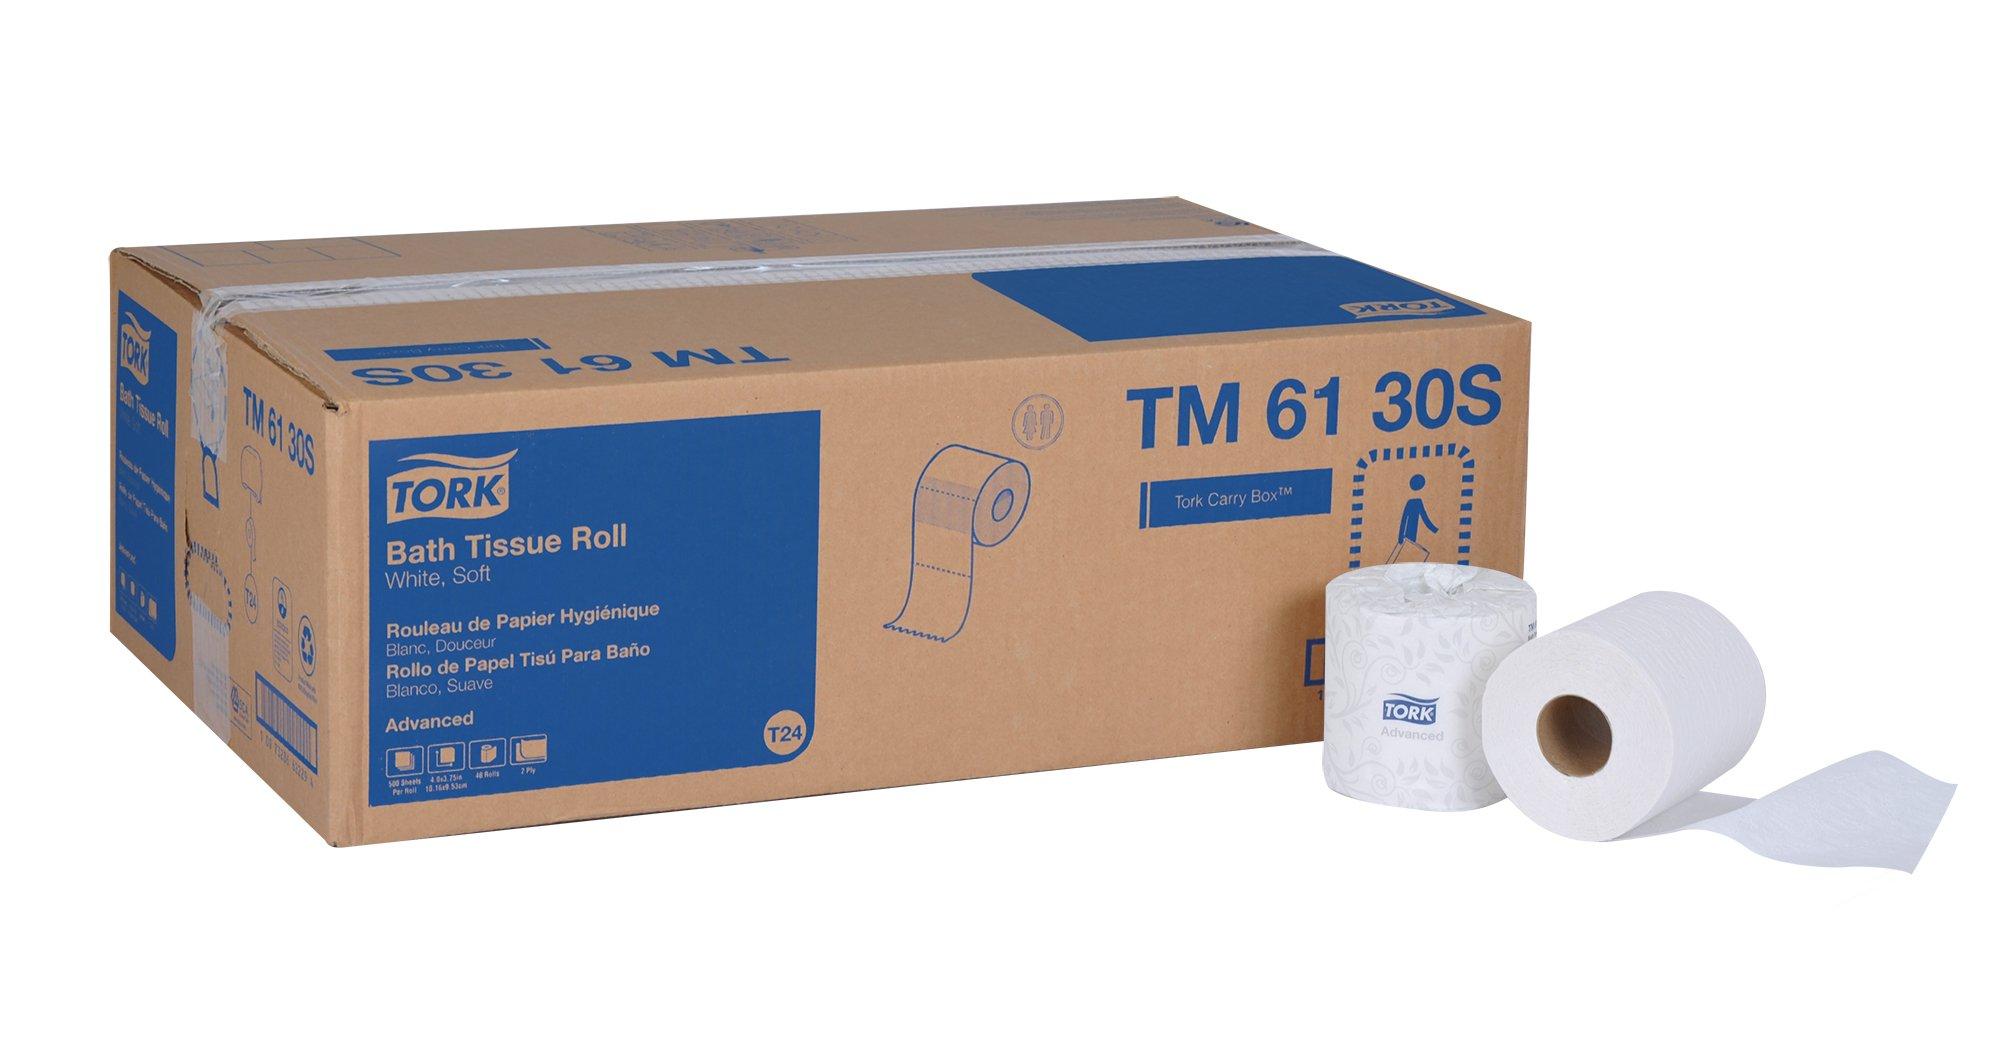 Tork Advanced TM6130S Bath Tissue Roll, 2-Ply, 4'' Width x 3.75'' Length, White (Case of 48 Rolls, 500 per Roll, 24,000 Sheets)